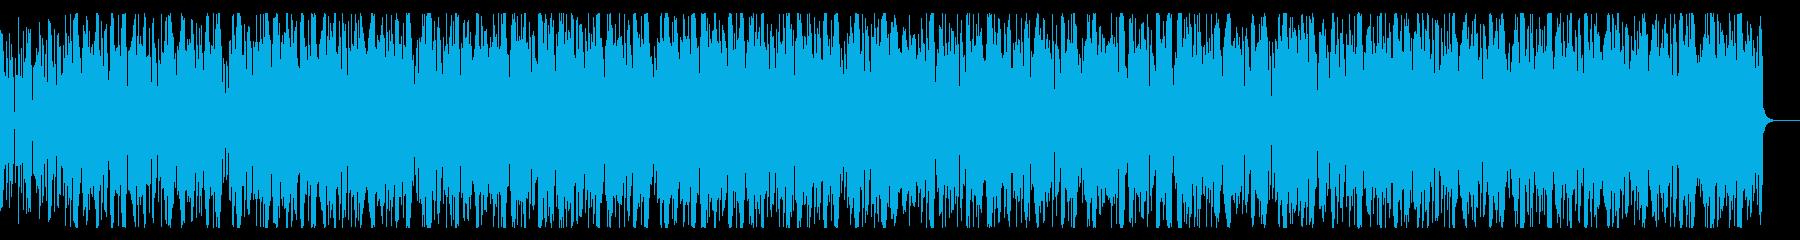 FUNKY 日本の叙情歌をソウルビートでの再生済みの波形